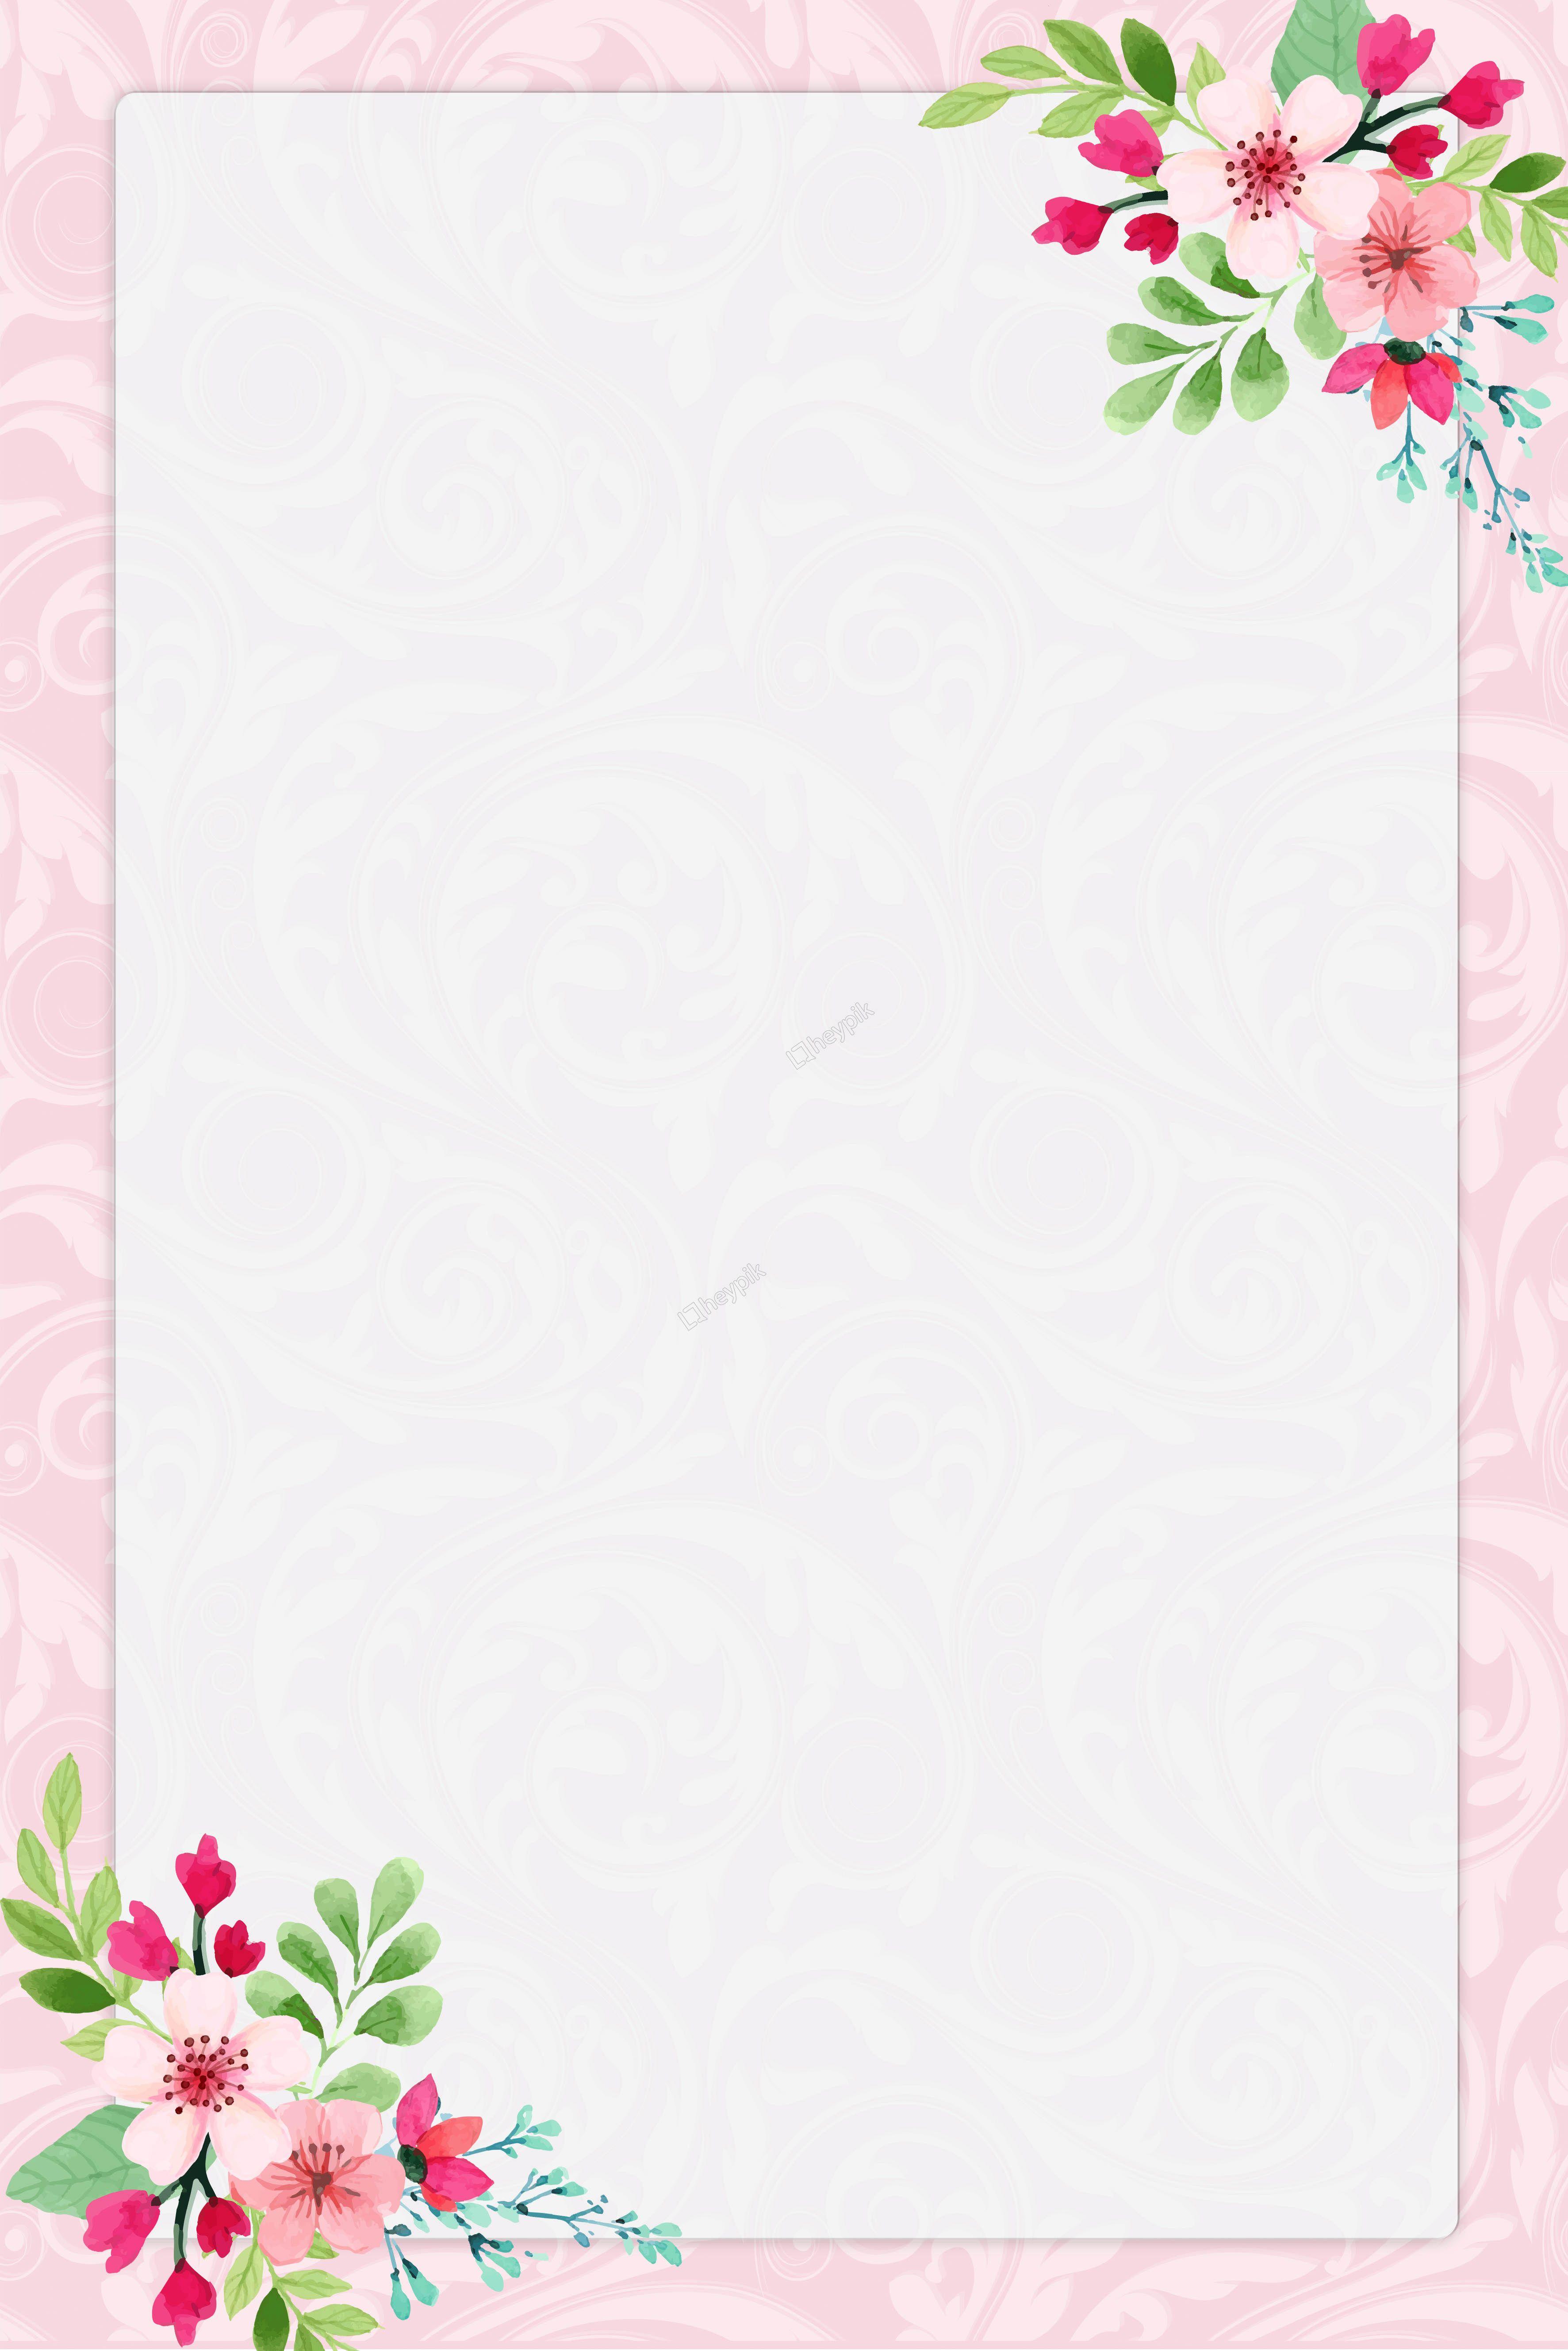 Download Flower Border Wallpaper Desktop Watercolor Design Floral